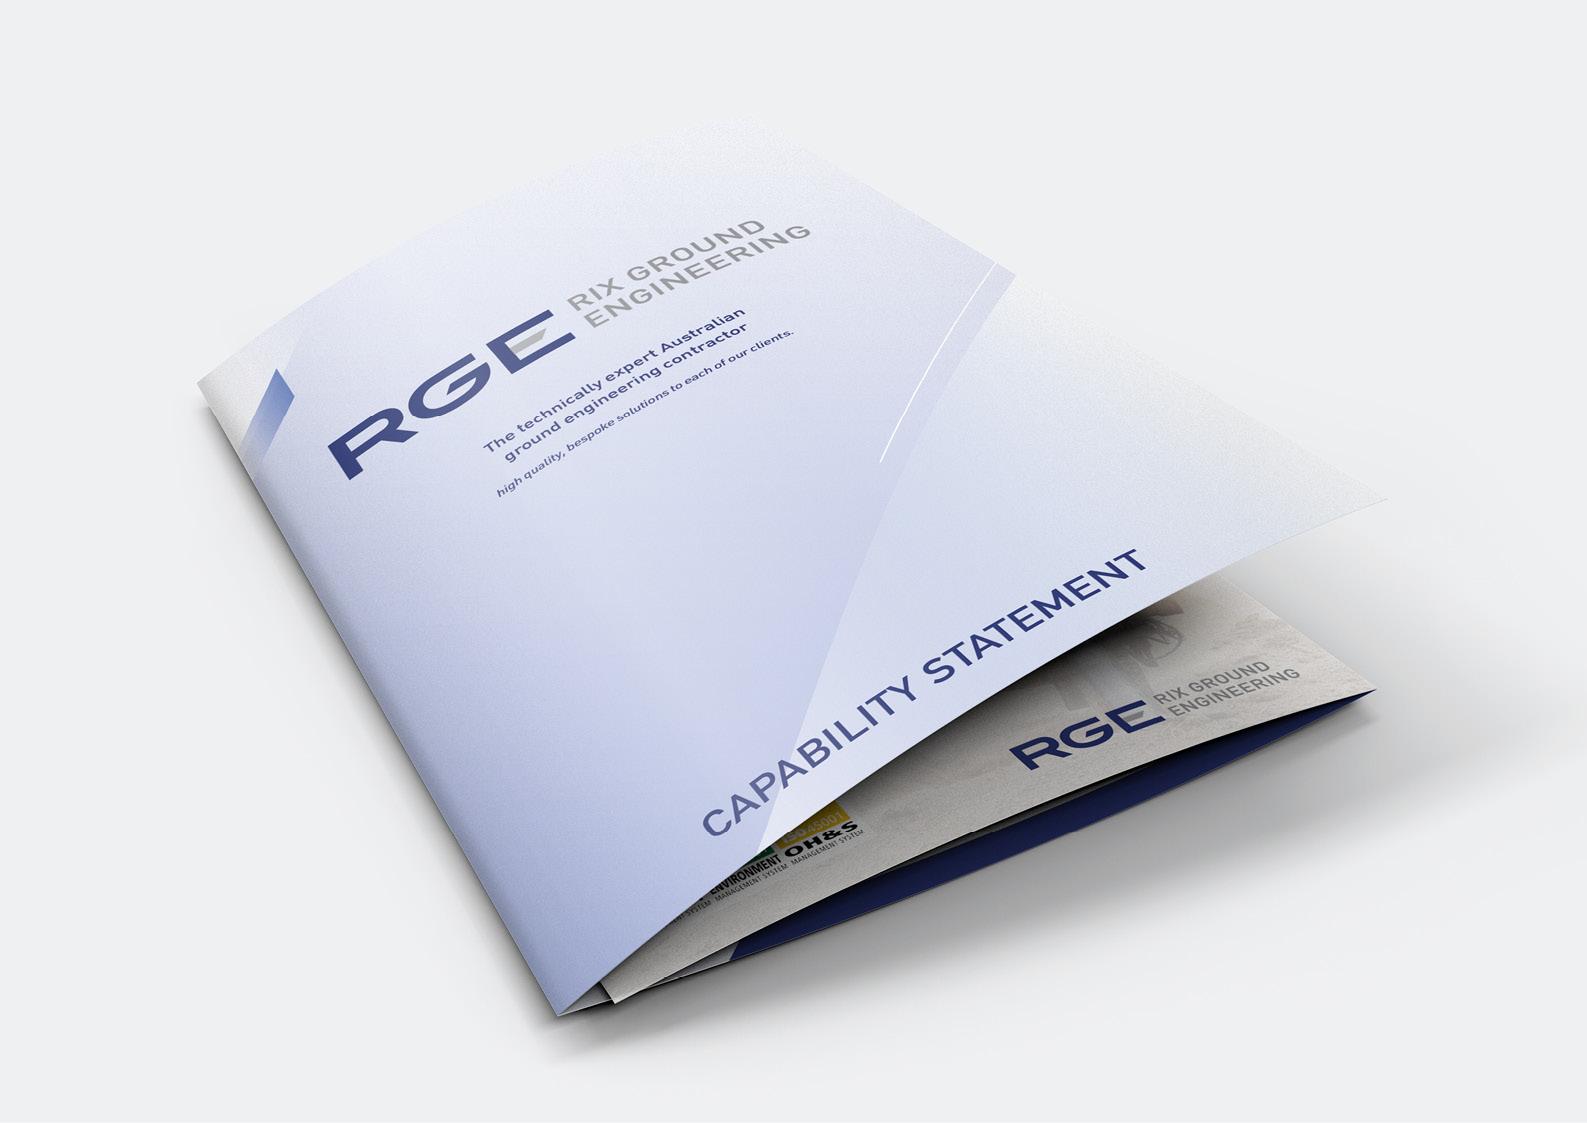 RGE Capability Statement